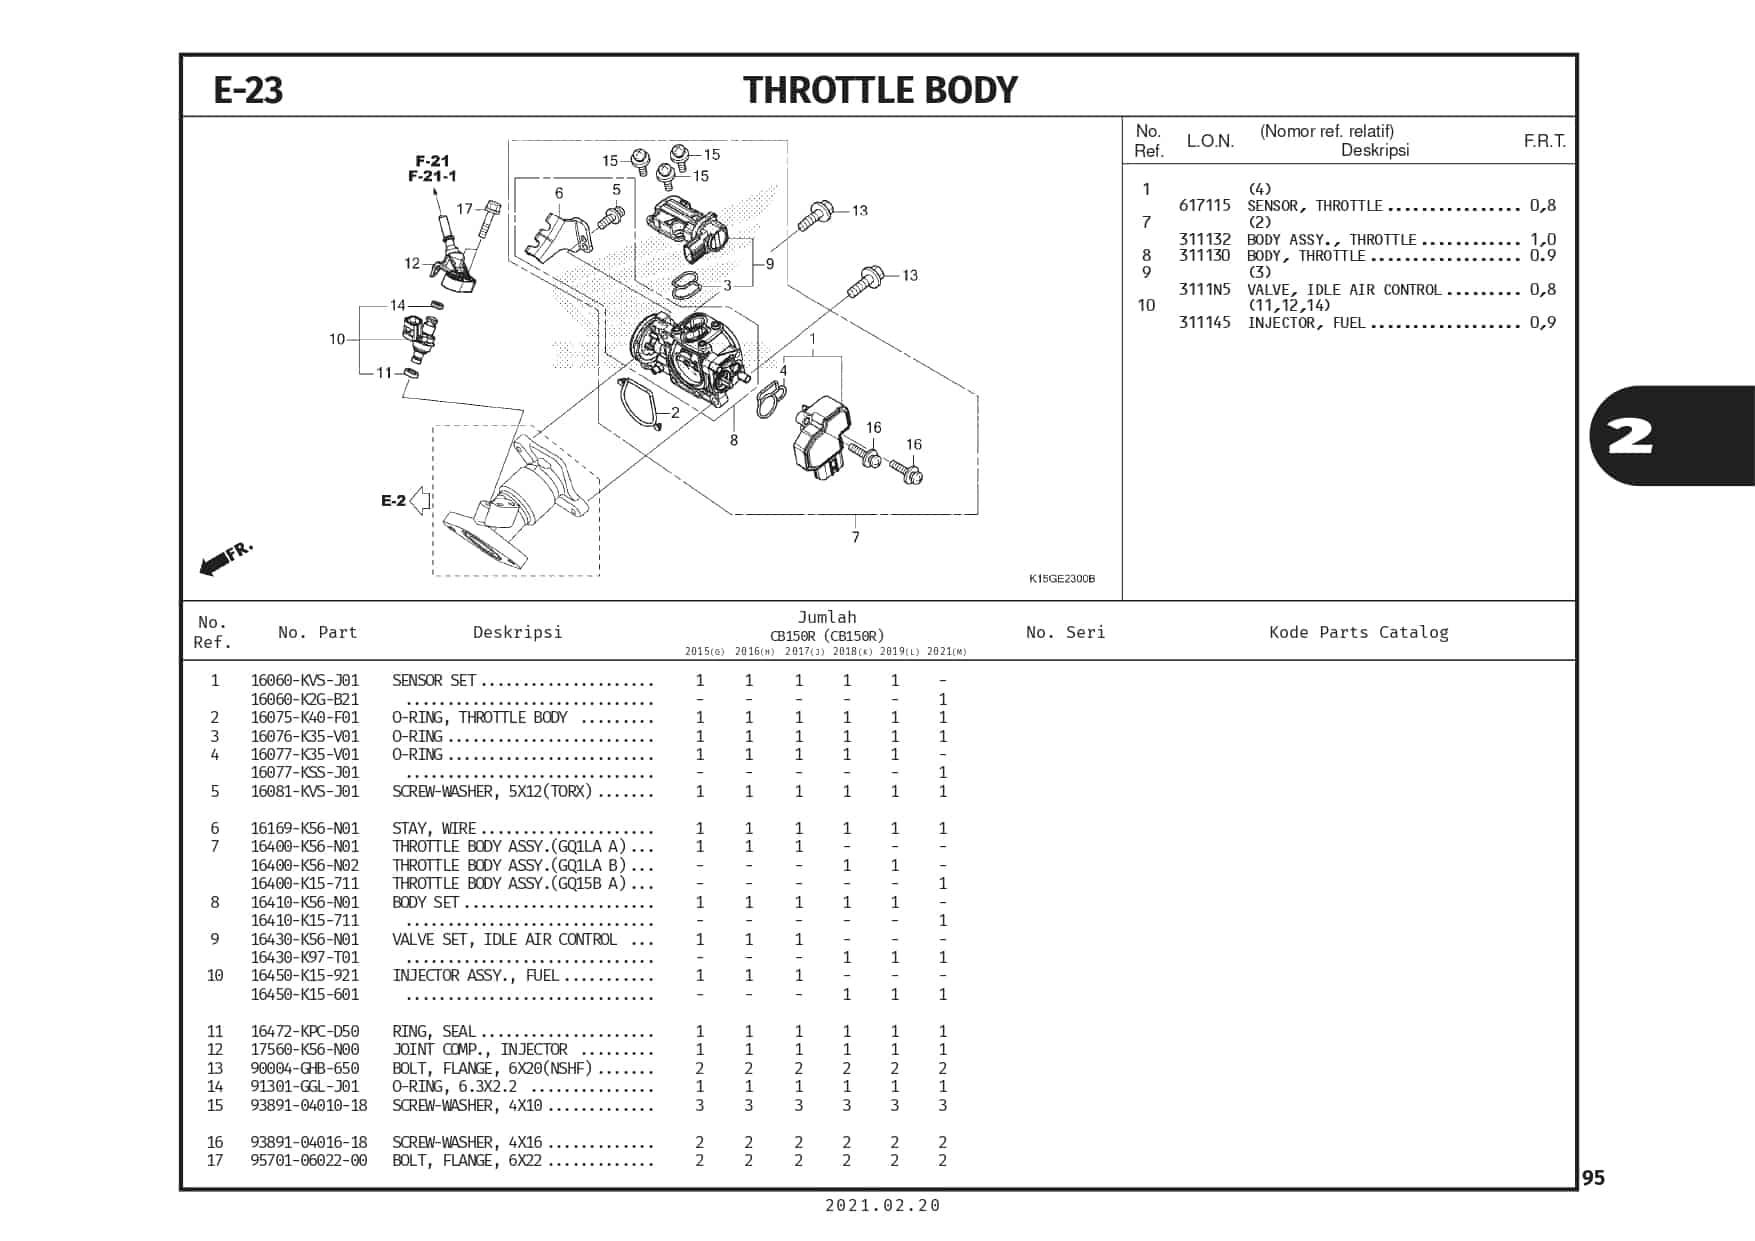 E-23 Throttle Body